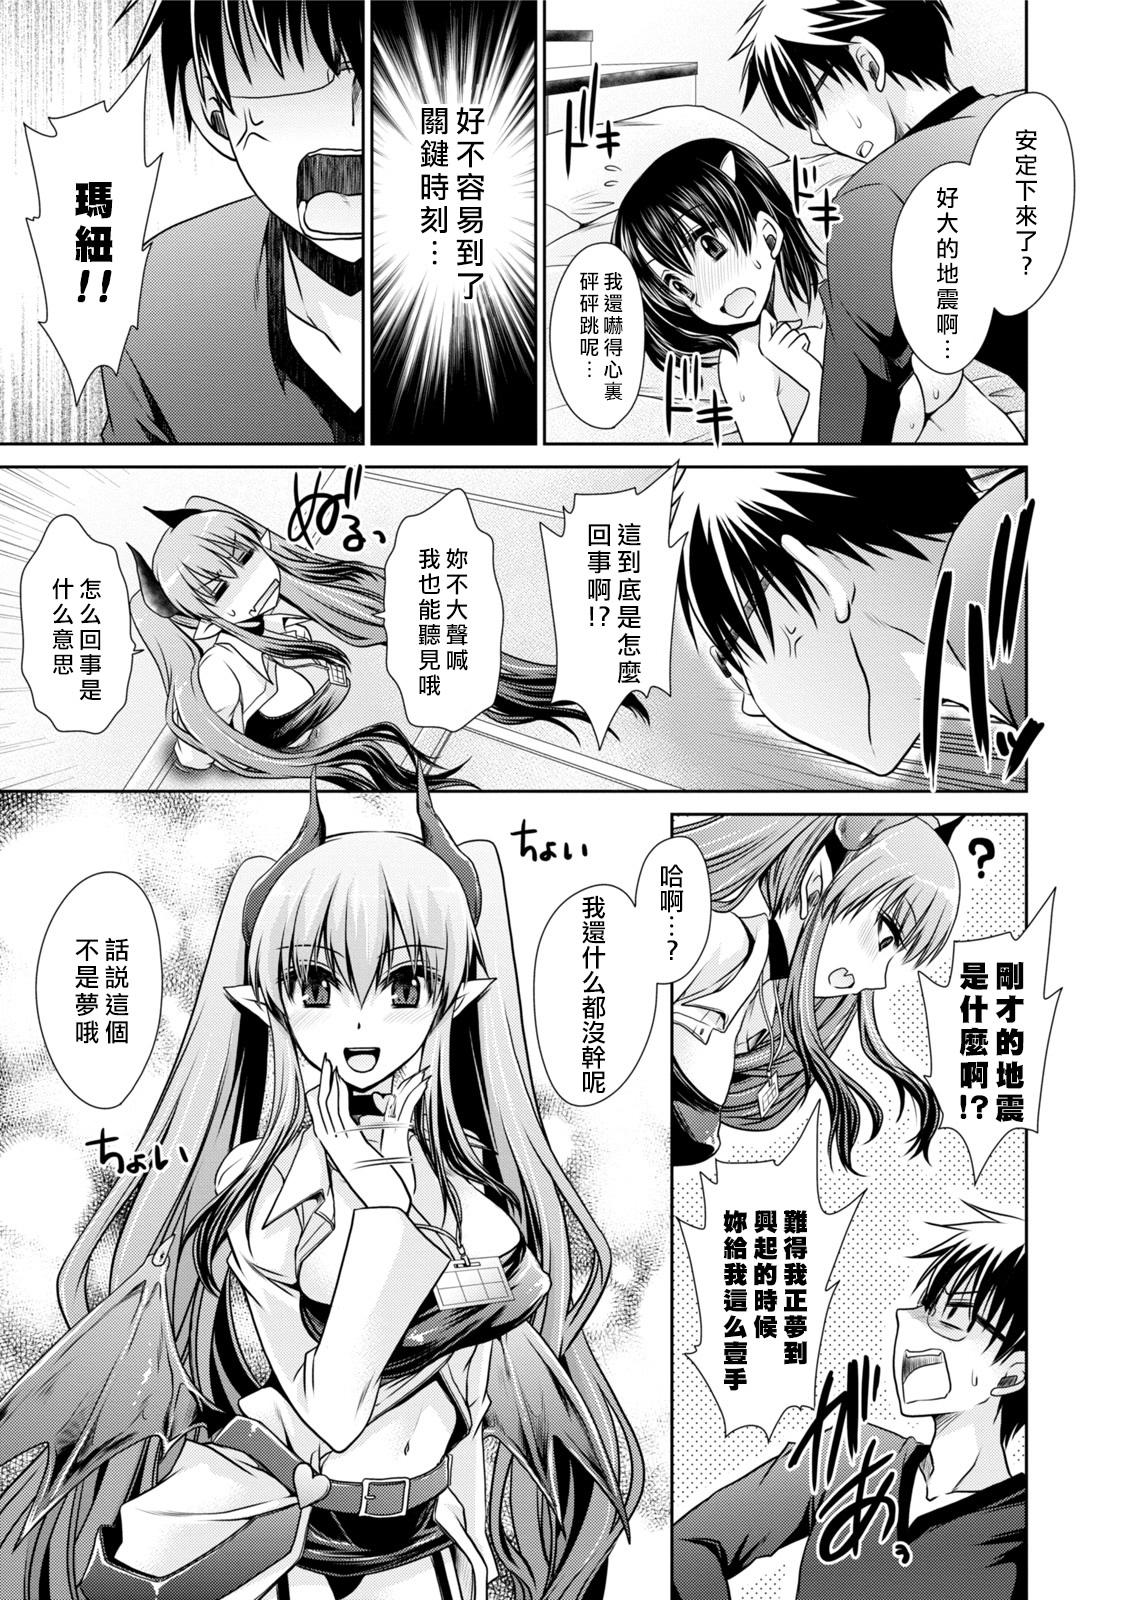 [Shinonome Ryu] Ore to Kanojo to Owaru Sekai - World's end LoveStory 1-5 [Chinese] [爱弹幕汉化组] [Digital] 106